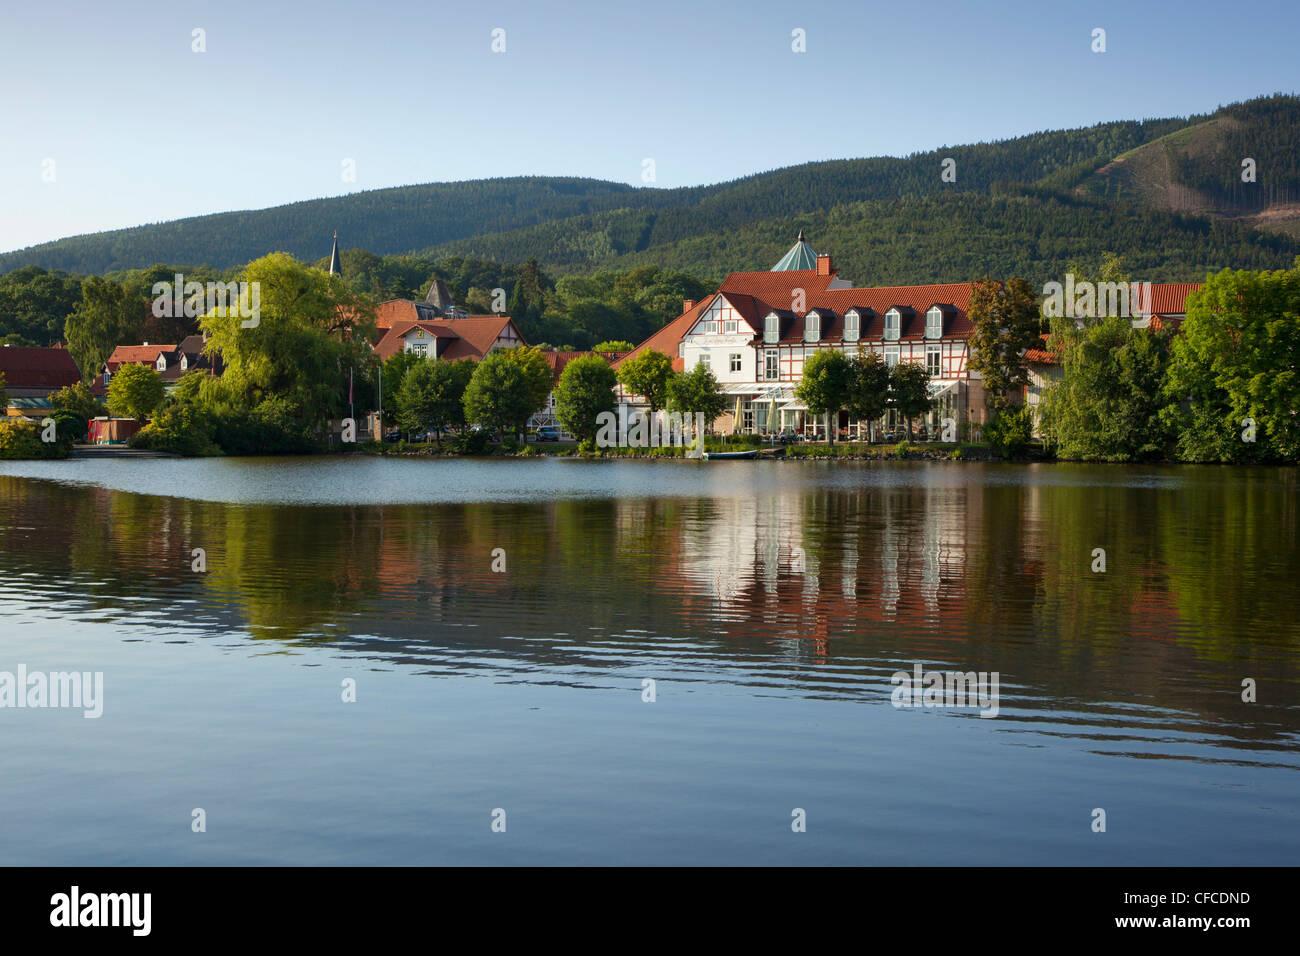 Trout lake near Hotel u201eZu den Rothen Forellenu201c Ilsenburg Harz mountains & Trout Lake Stock Photos u0026 Trout Lake Stock Images - Alamy